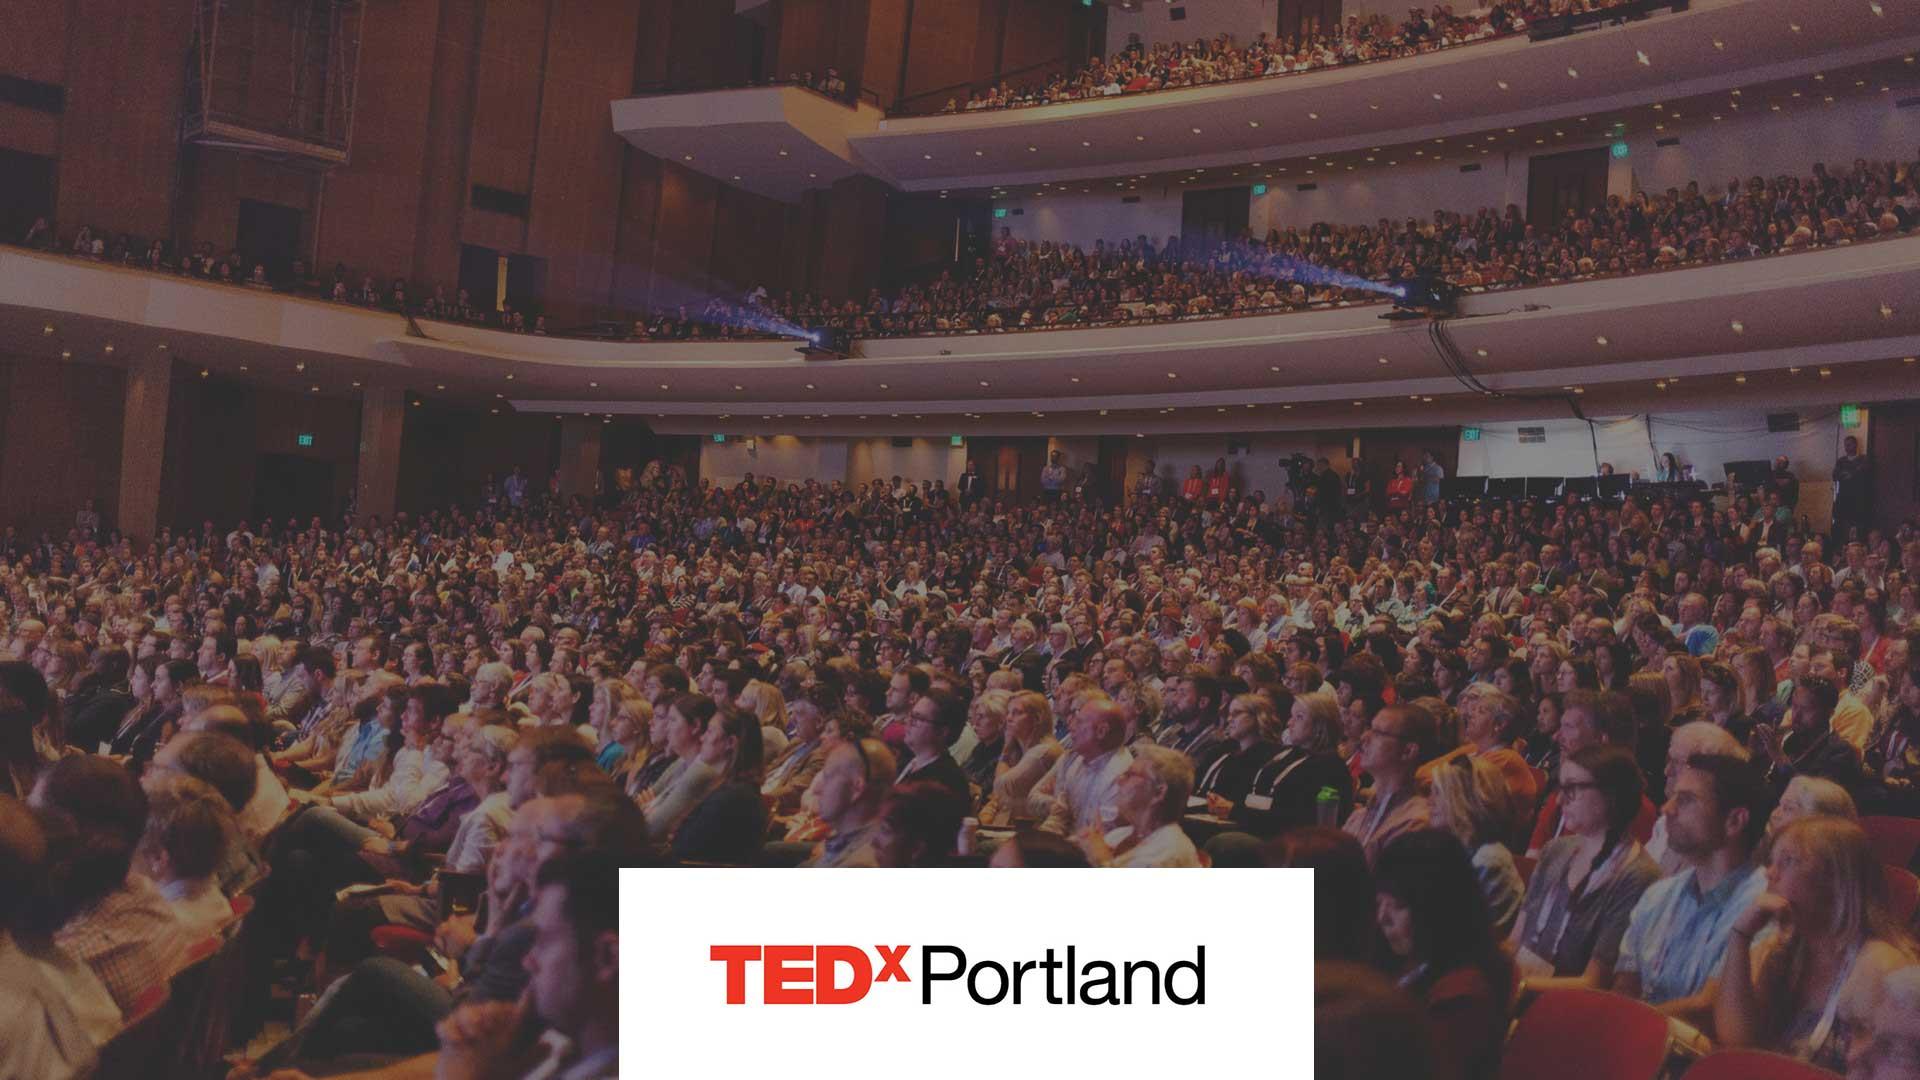 SHORT FILM @ TEDx PORTLAND